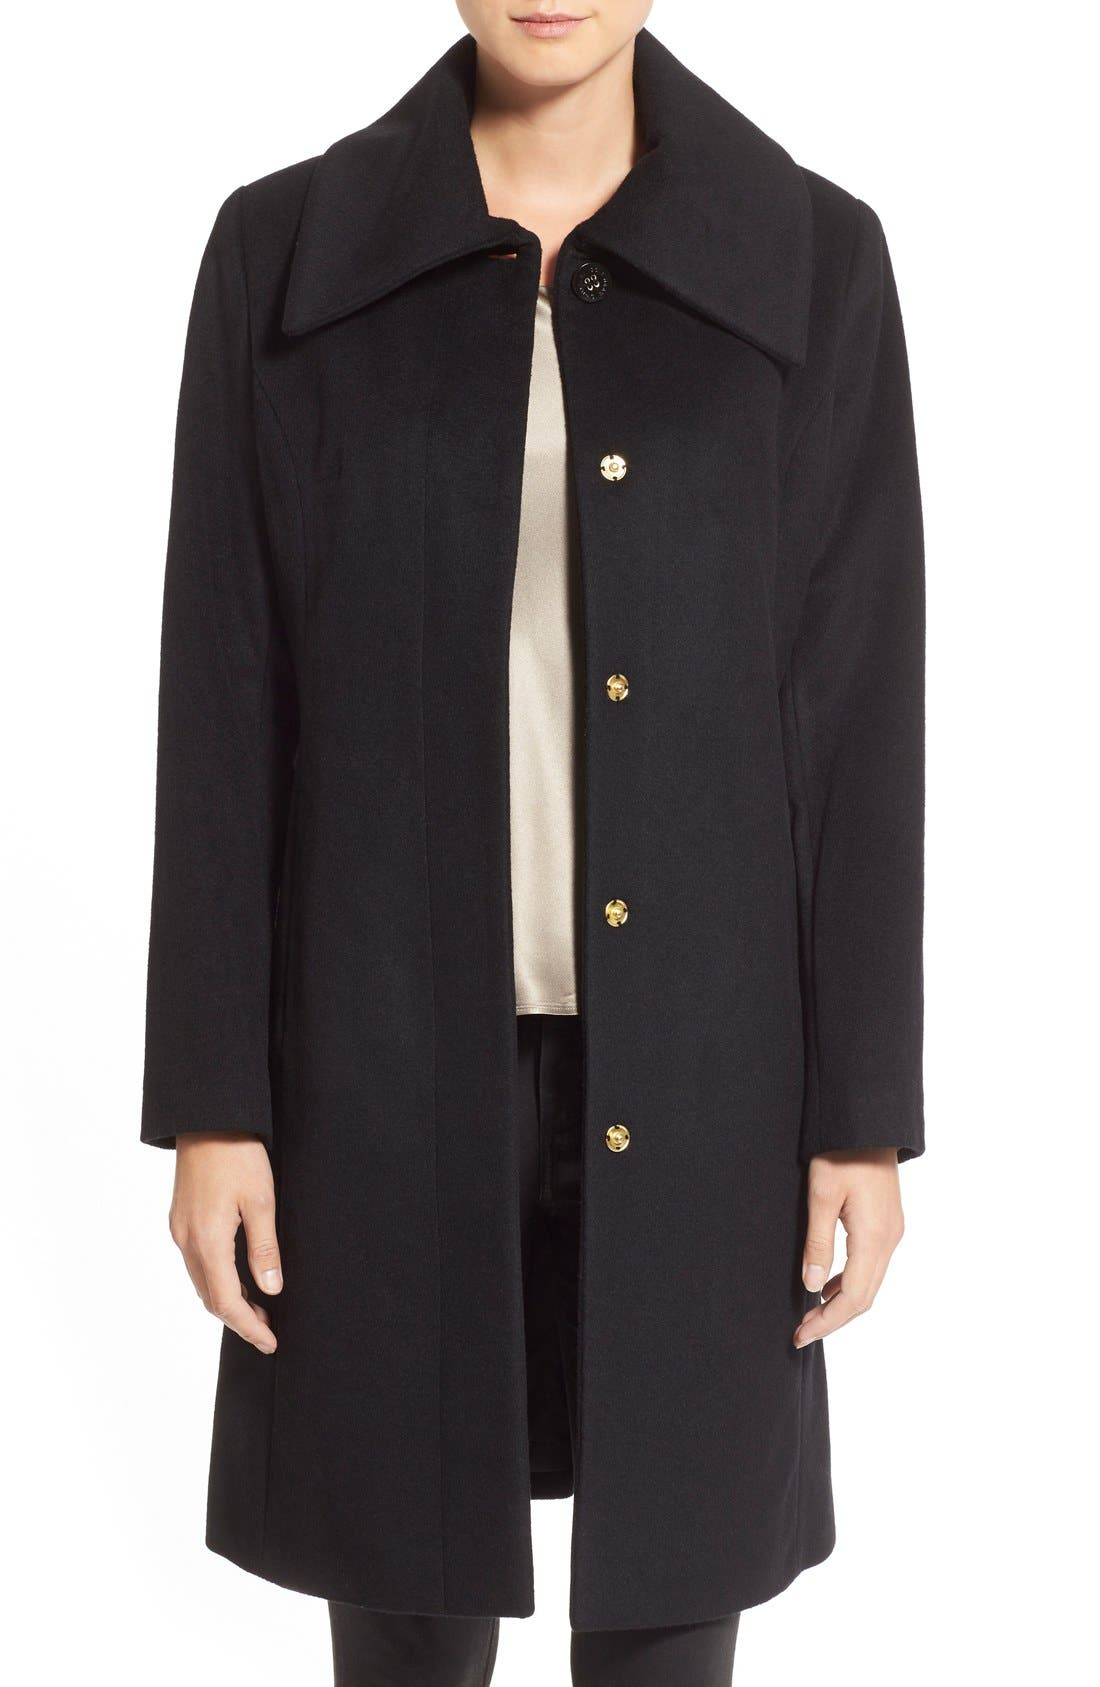 Main Image - Cole Haan SignatureSingle Breasted Wool Blend Coat (Regular & Petite)